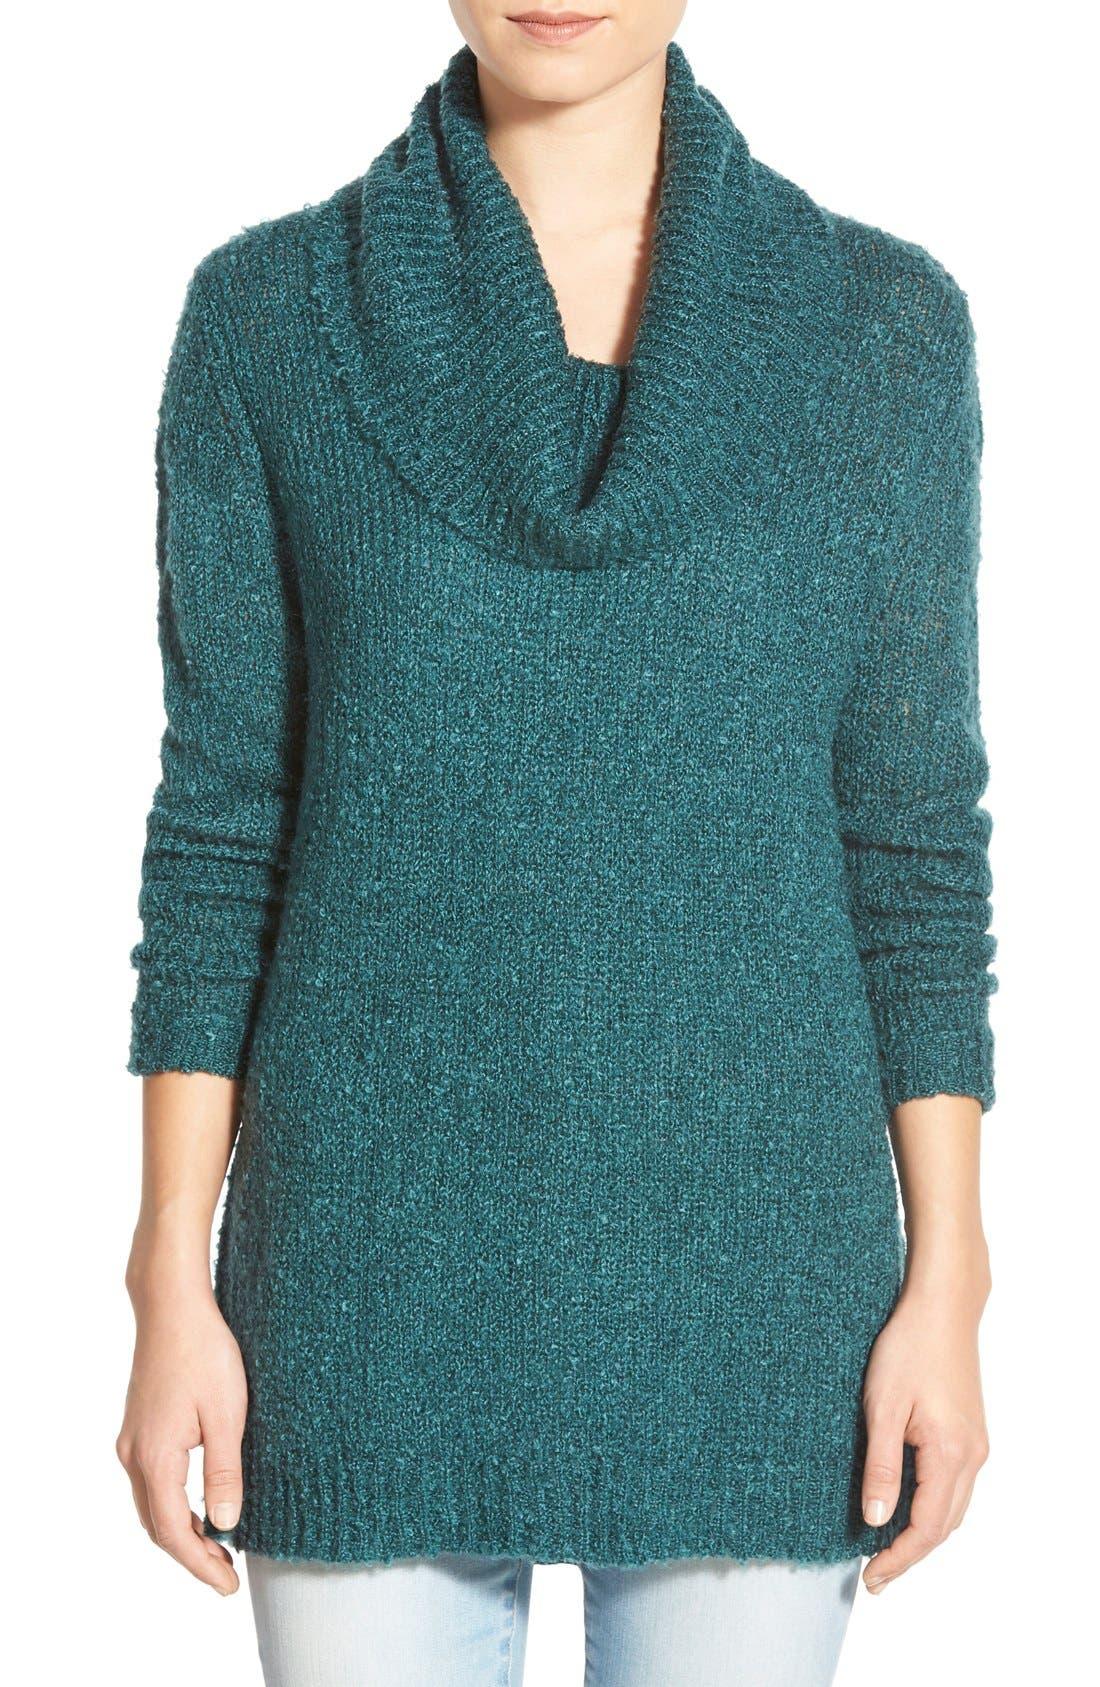 Main Image - BP. Cowl Neck Tunic Sweater